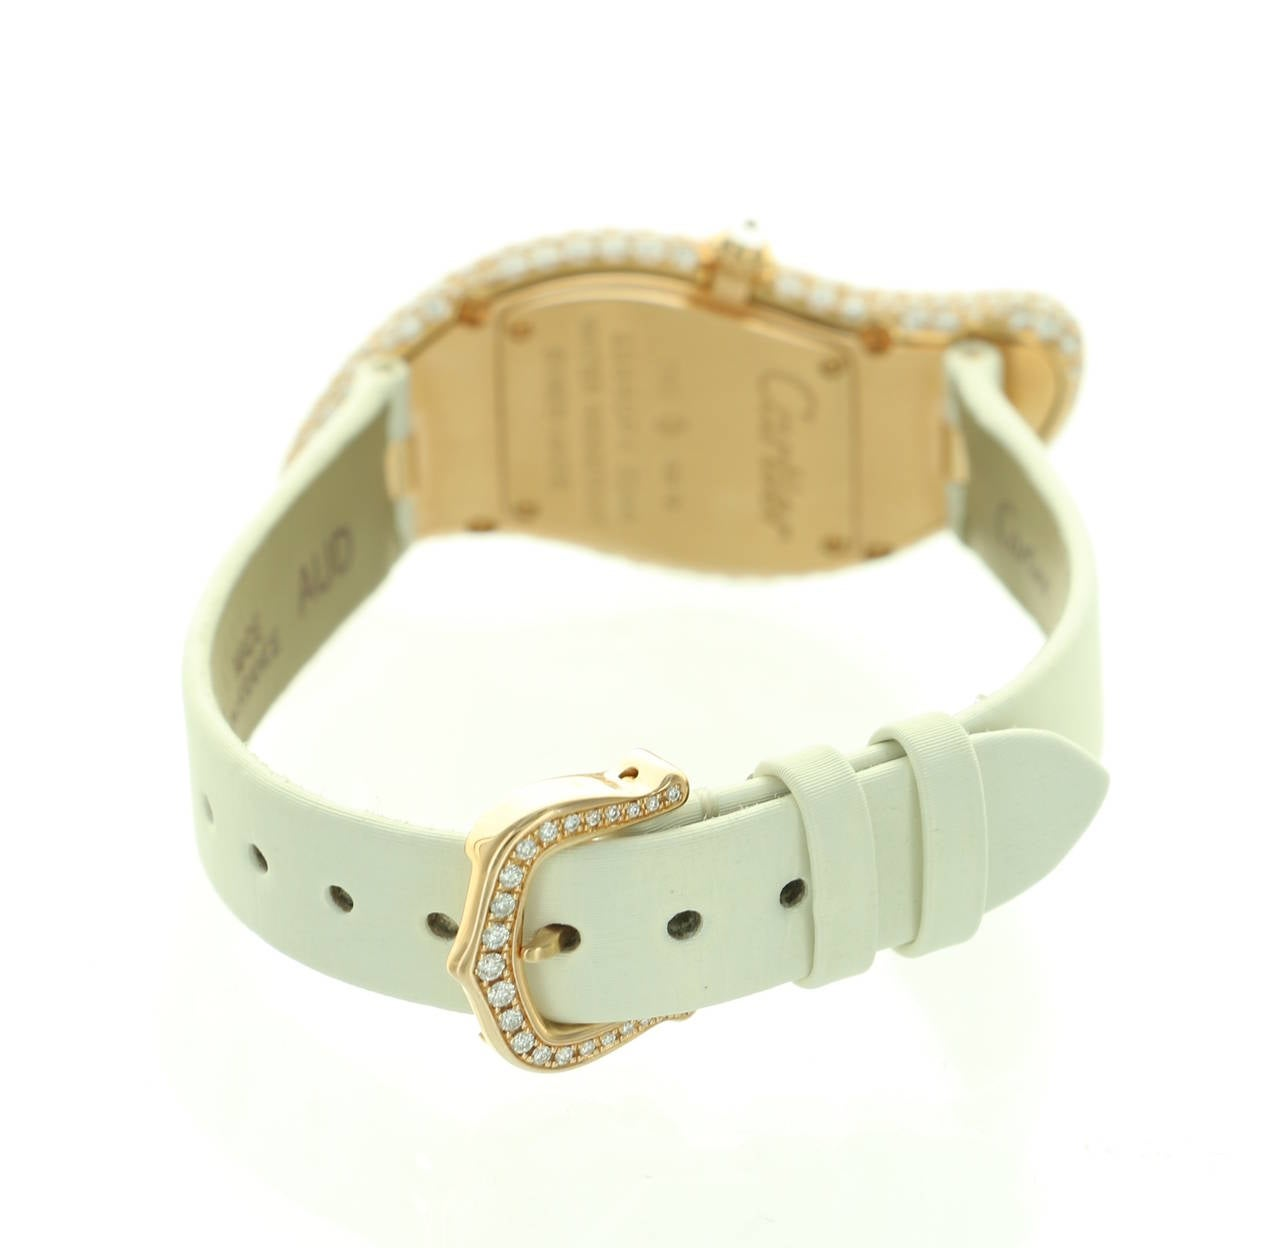 Cartier Lady's Rose Gold Baignoire Wristwatch Ref 3248 6